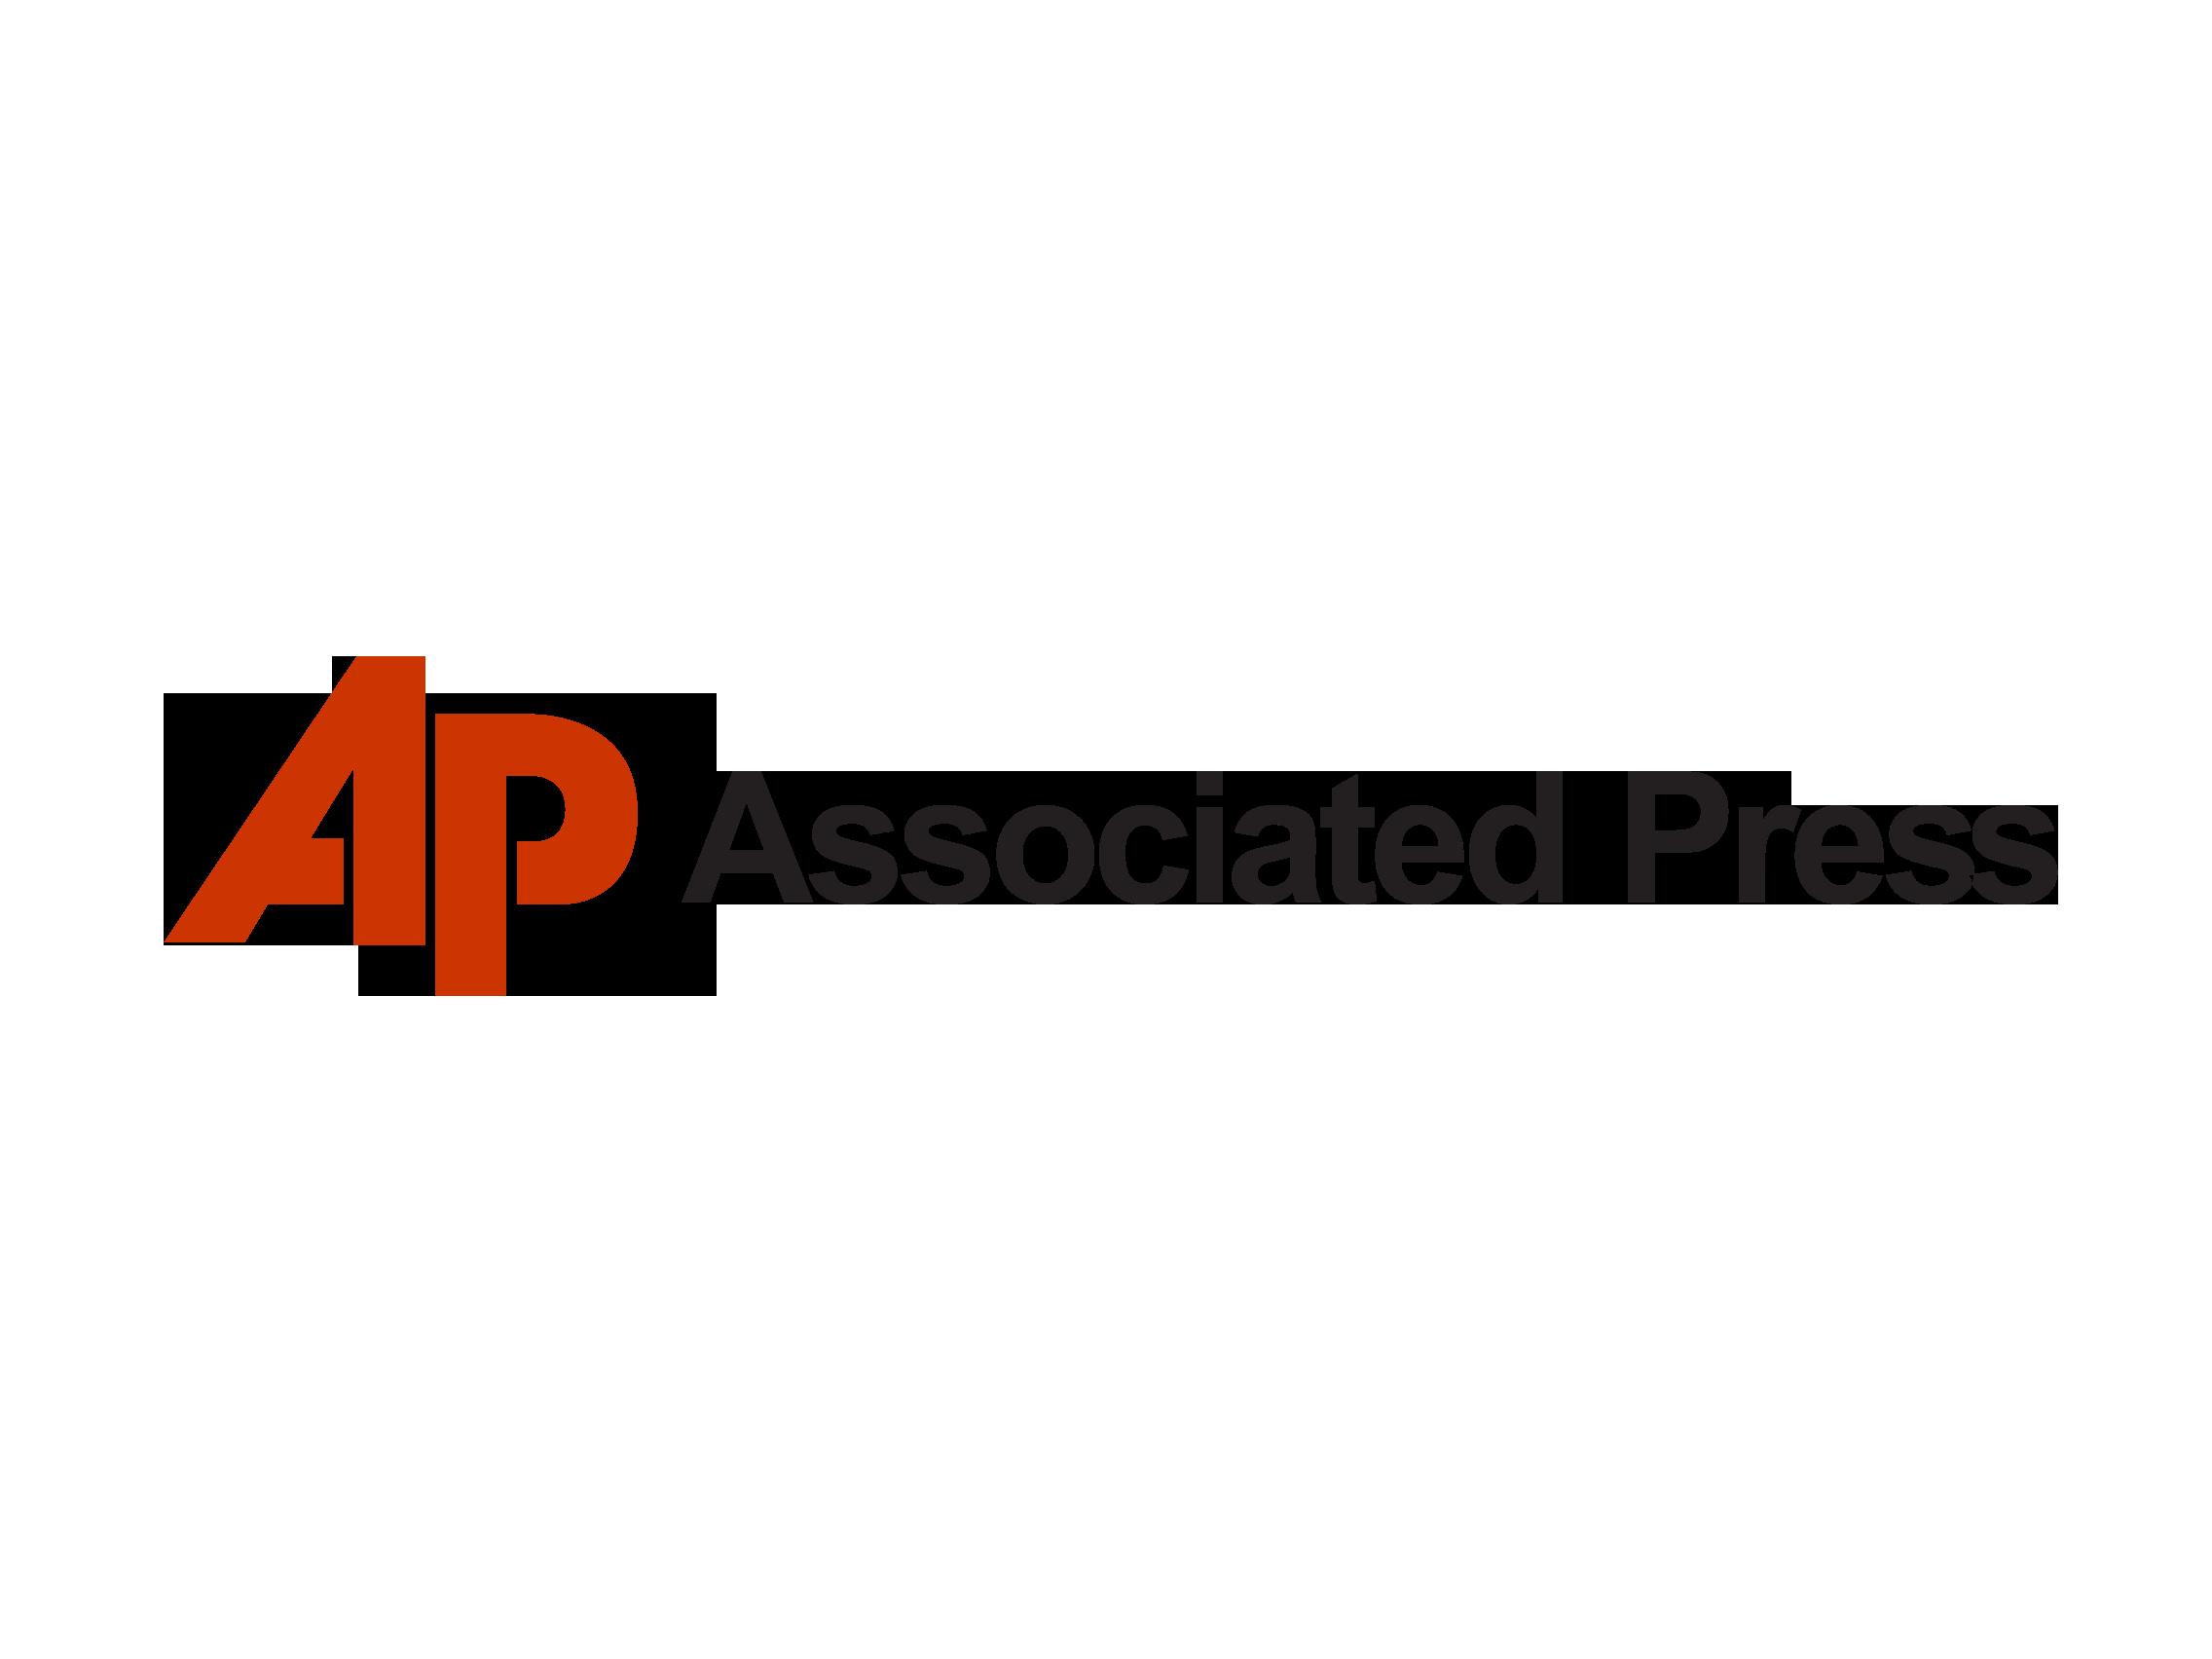 MN Opera- Associated Press